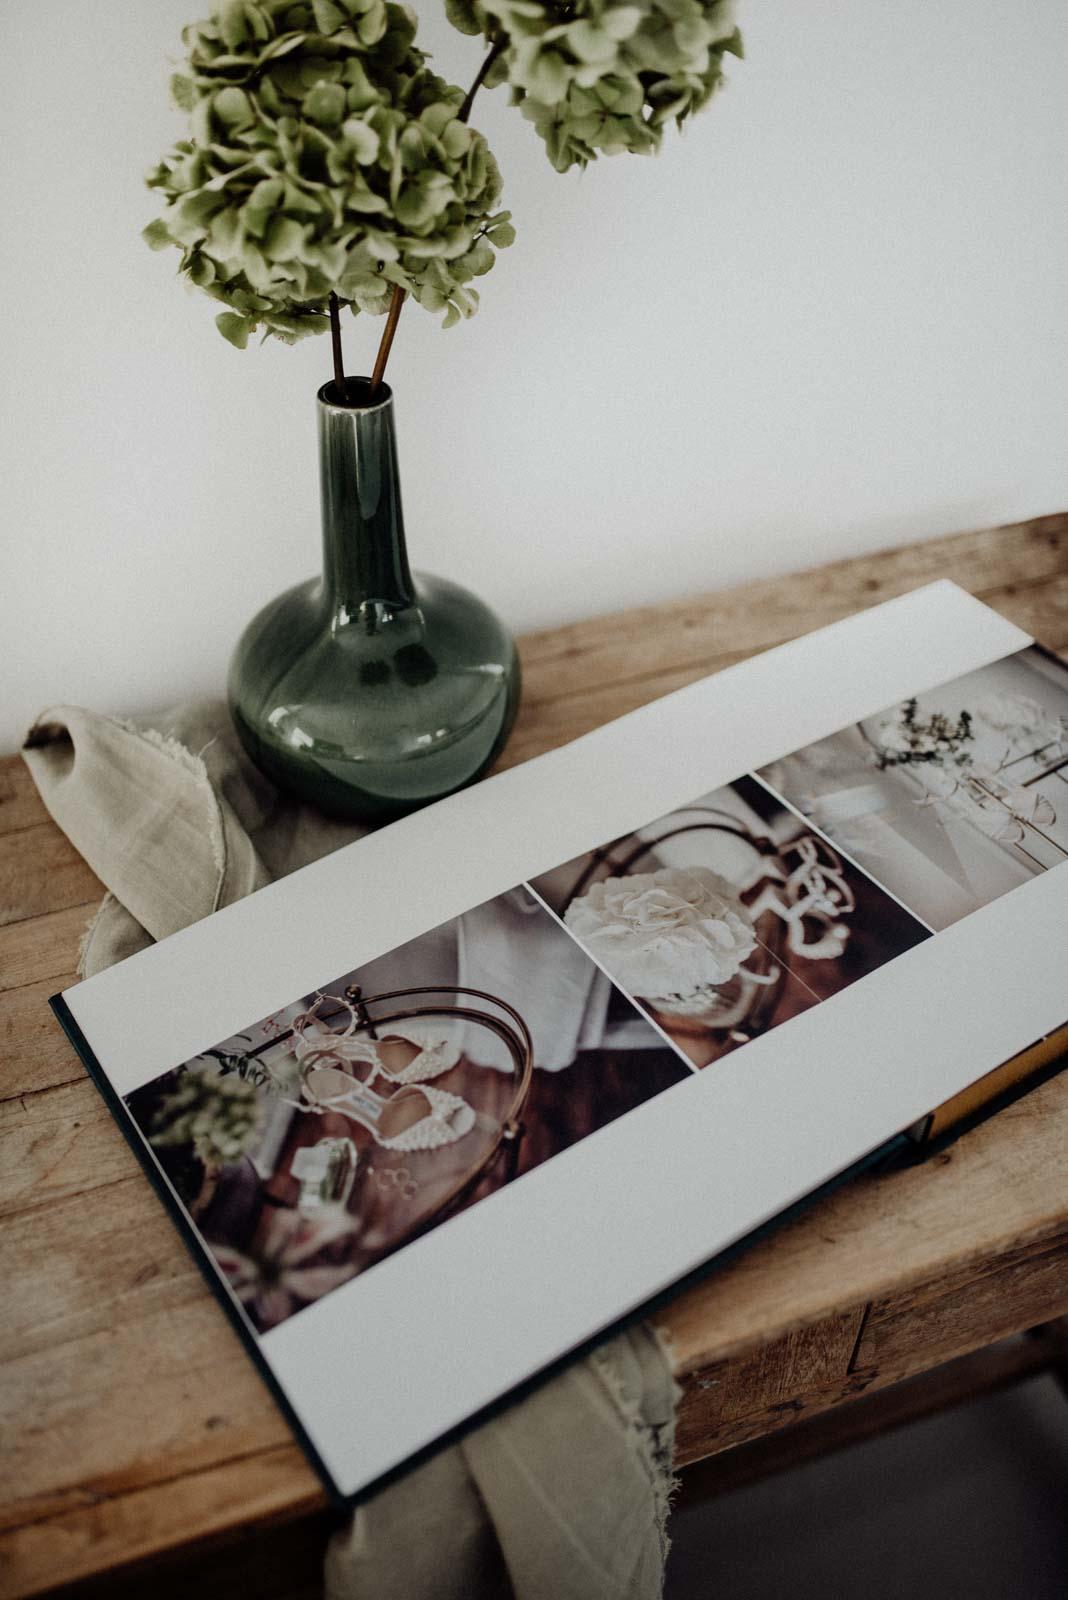 030-Fotoalbum-Fotobuch-Premium-Fotograf-Witten-Luxus